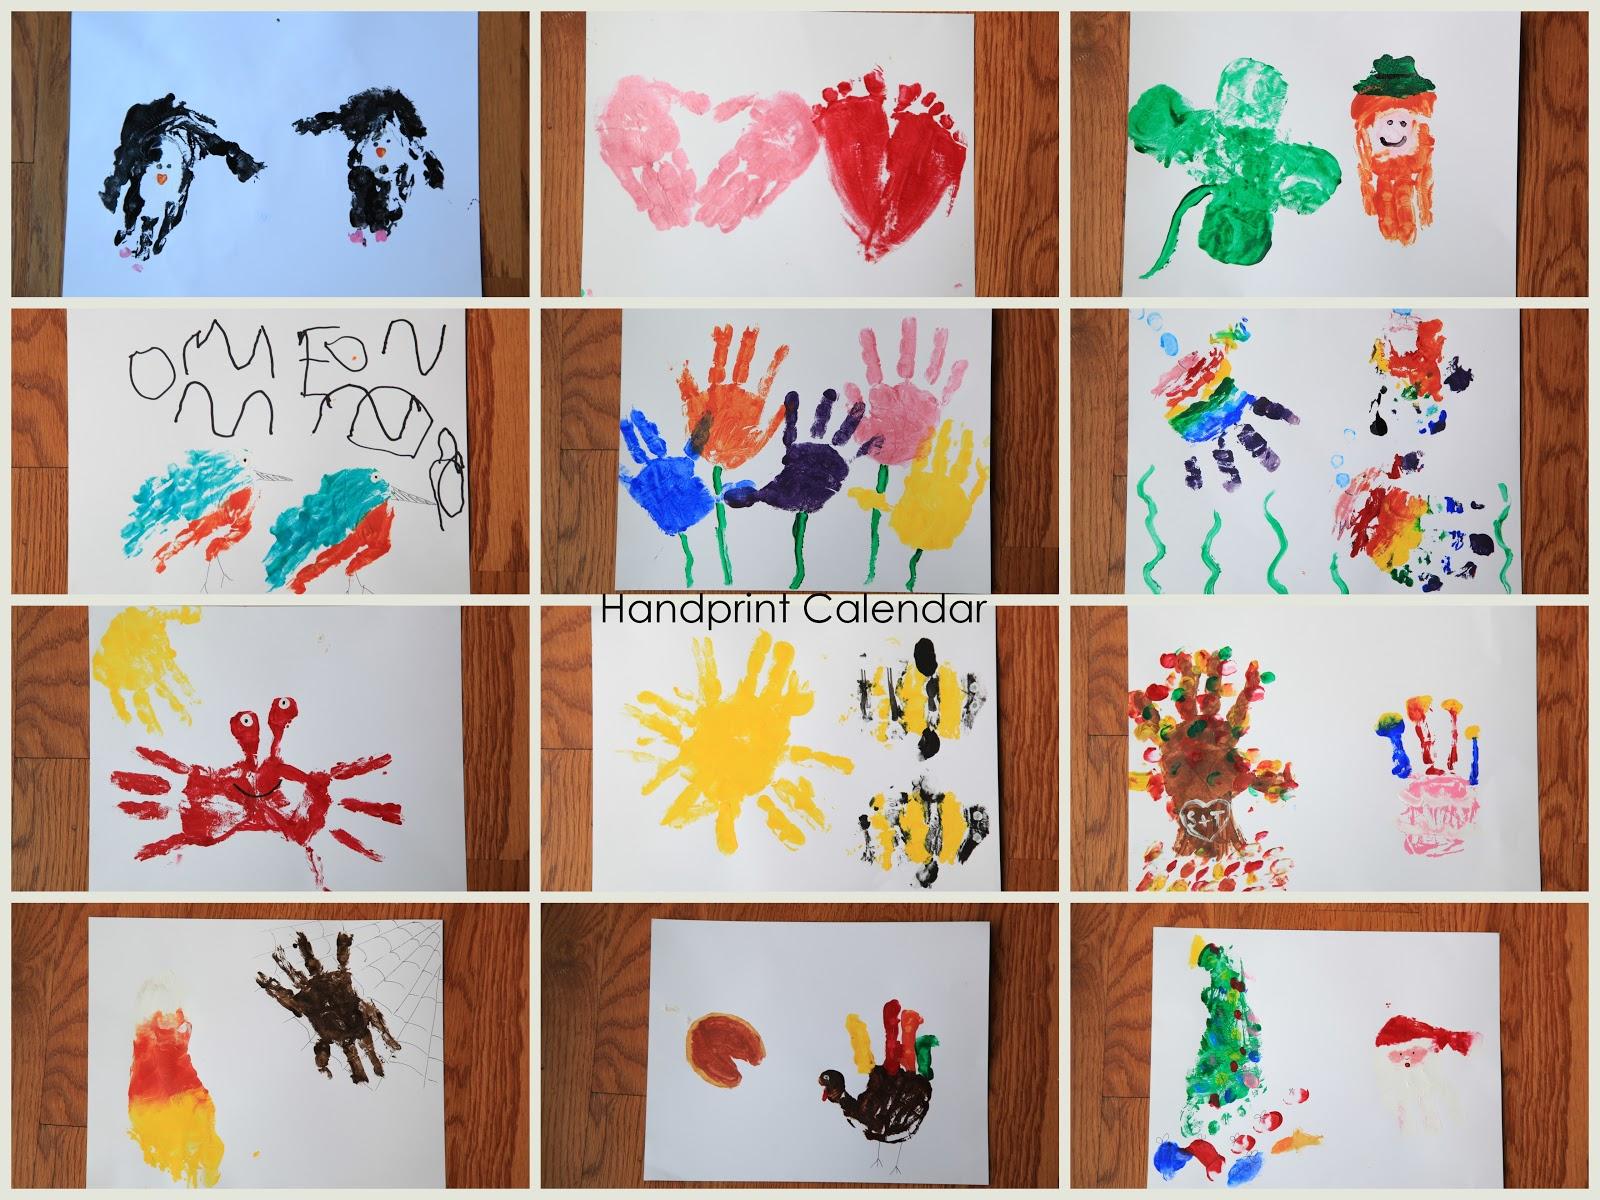 A Million Things I Love . . .: #657 - handprint calendar 2013